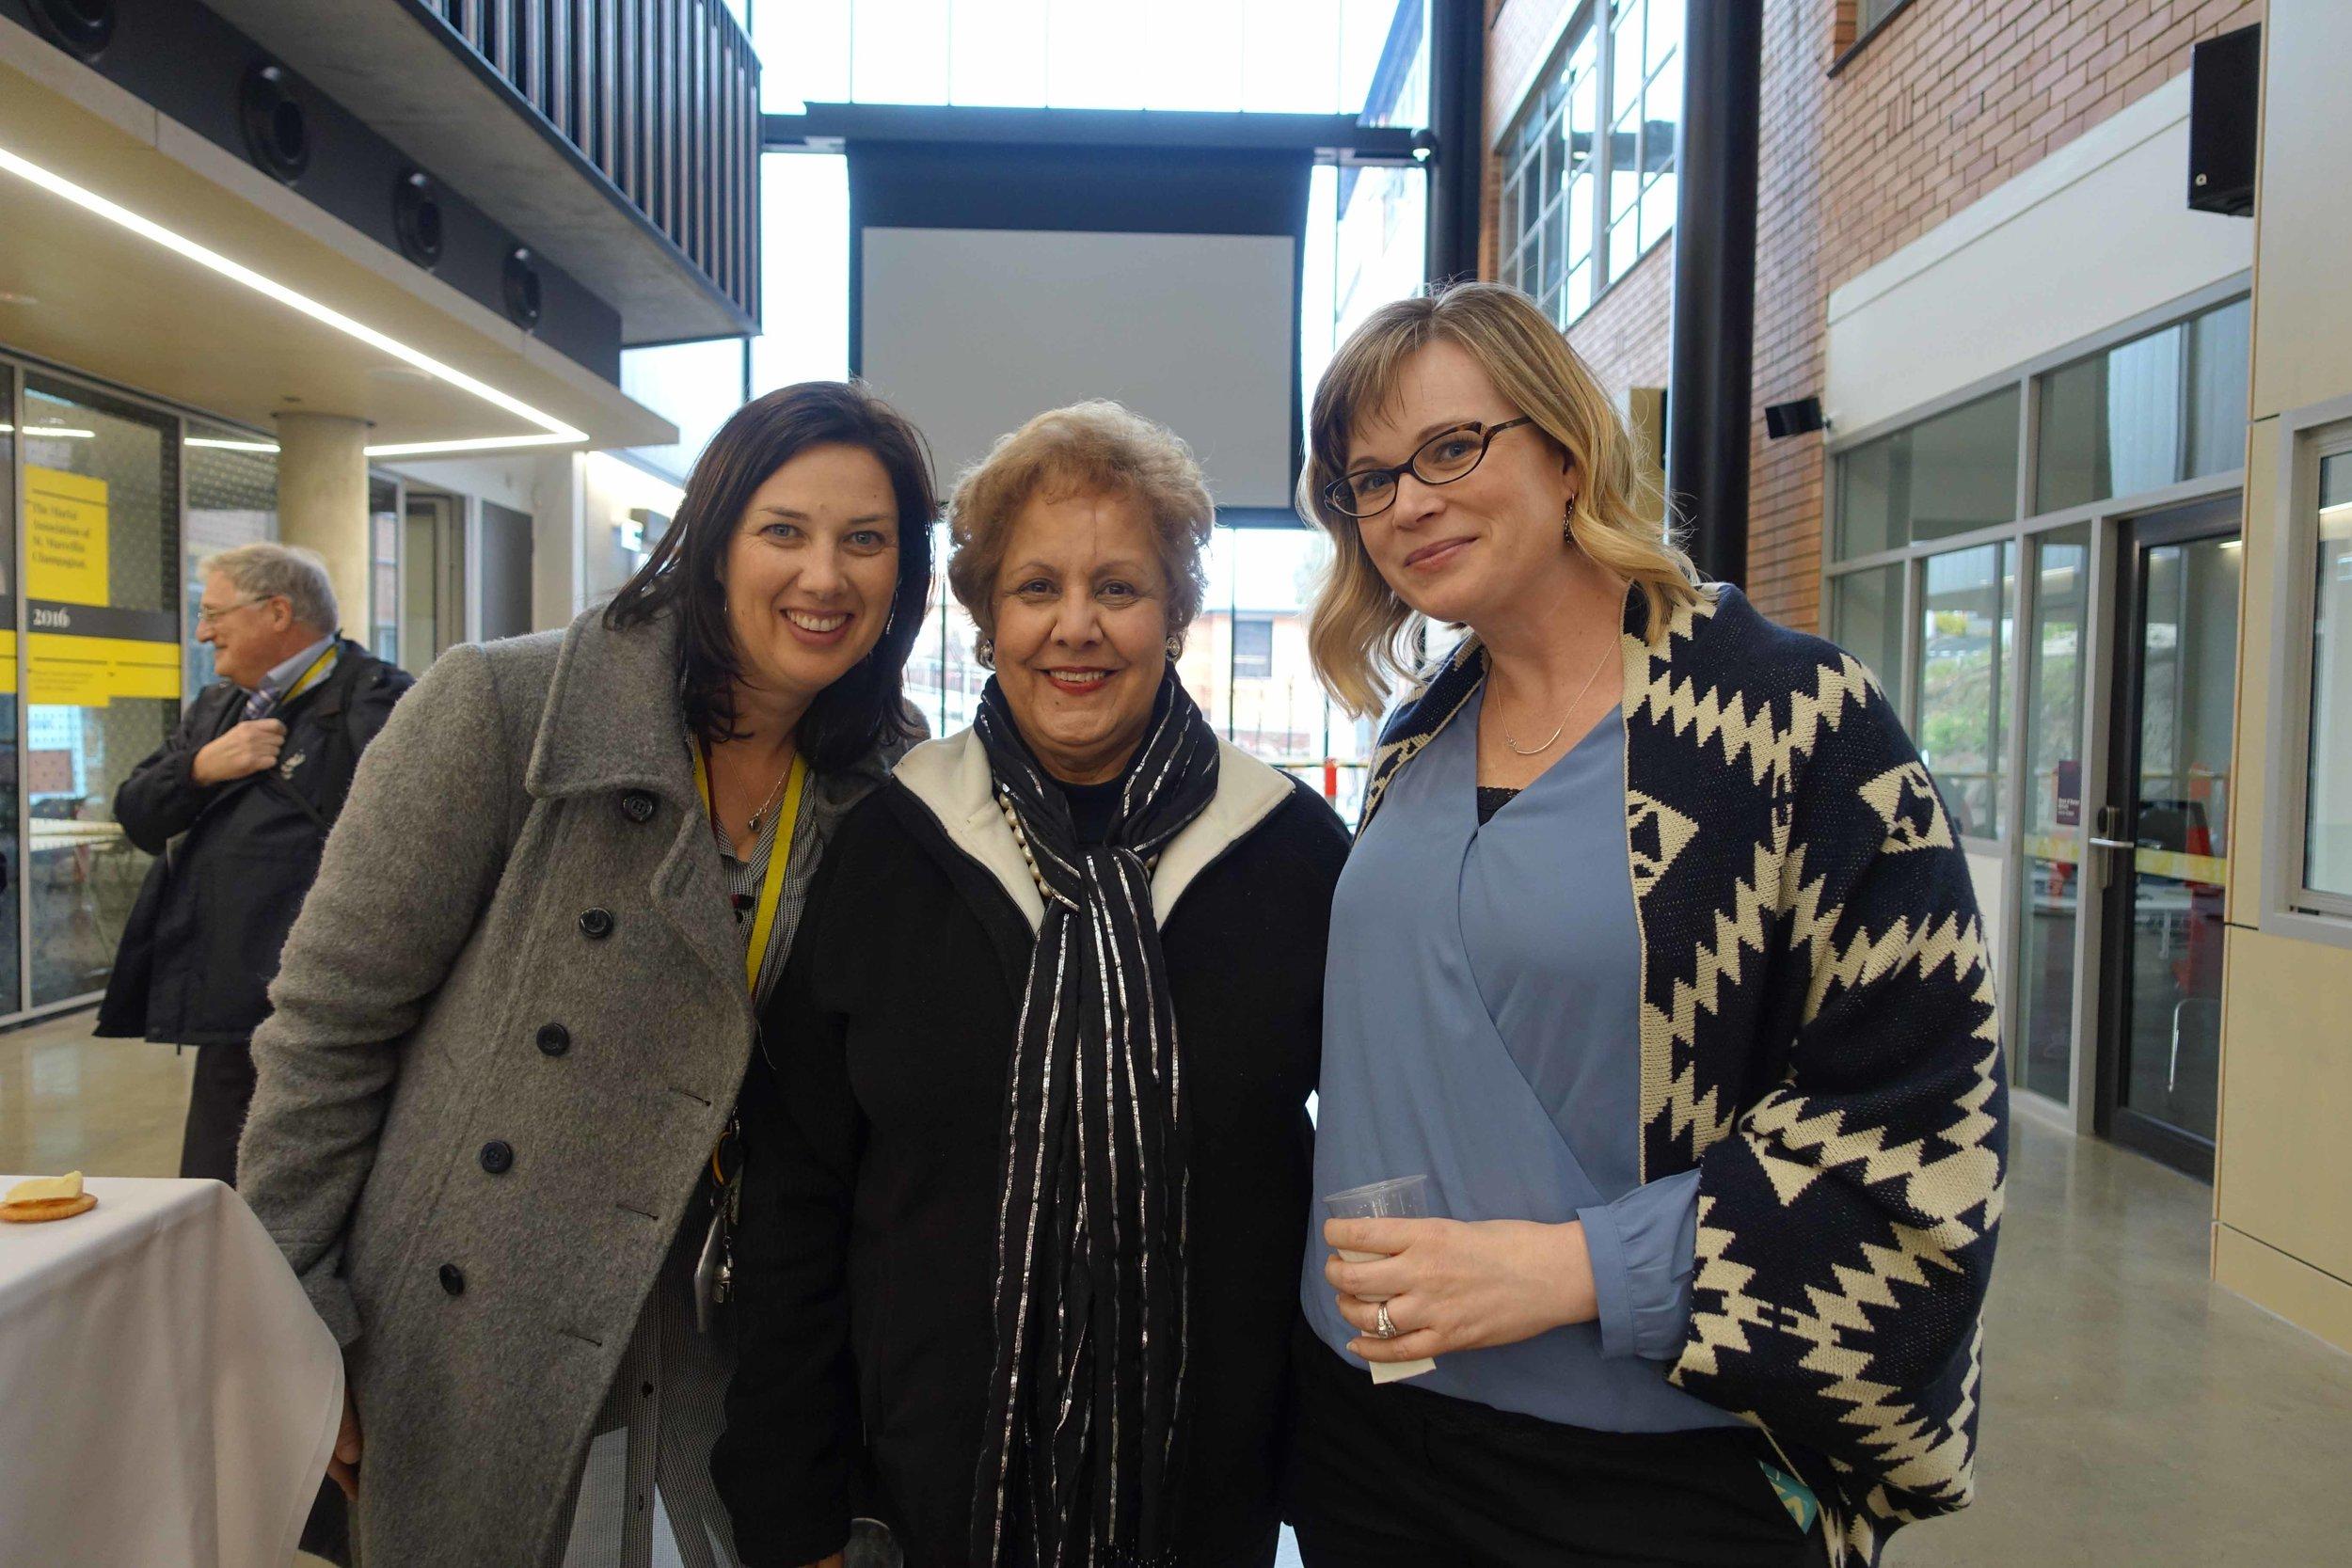 Melbourne Gathering Marcellin College-1-8.jpg